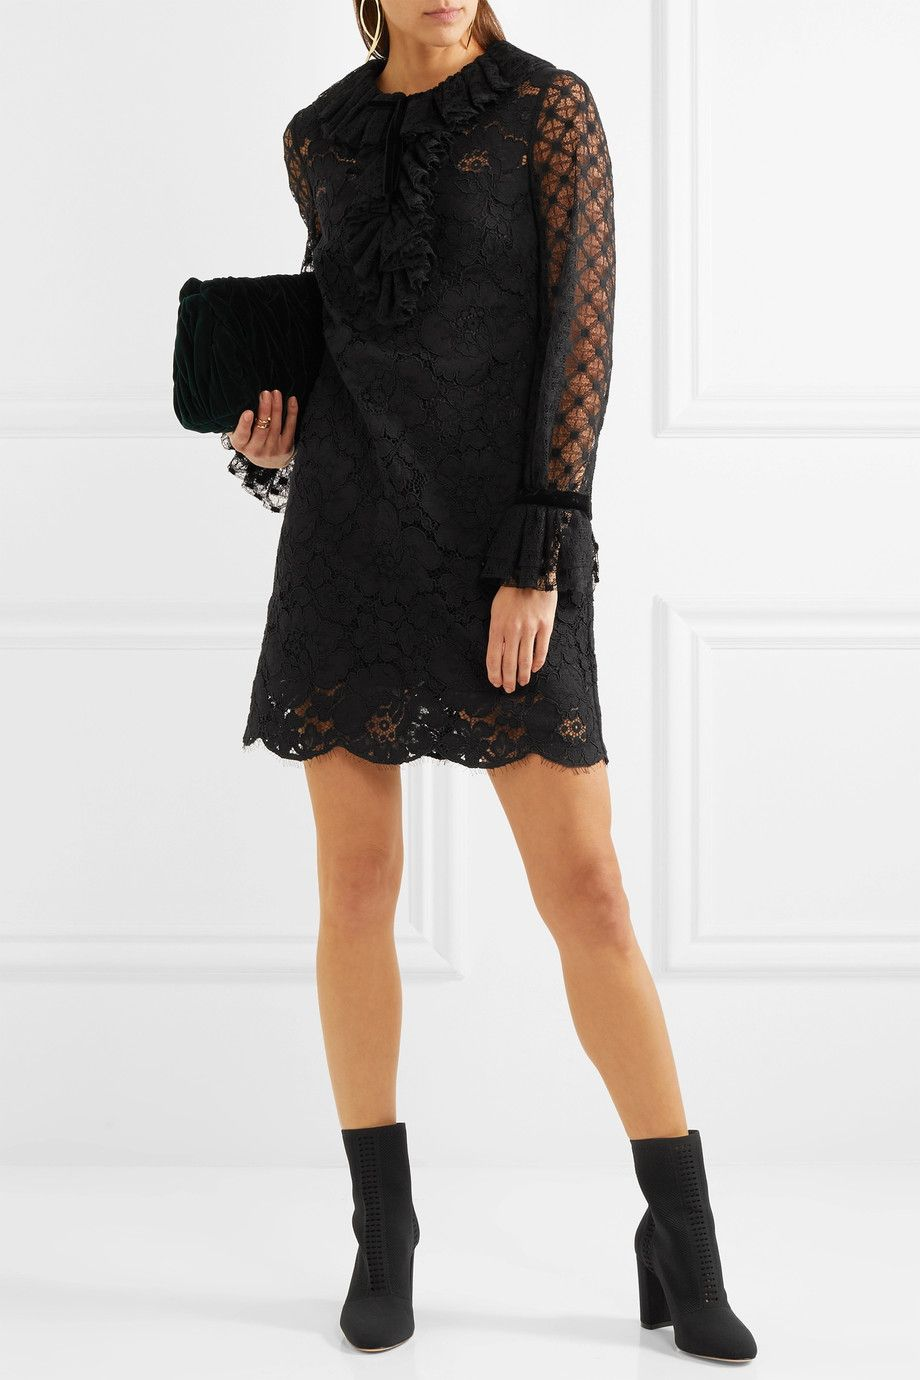 Velvet-trimmed Ruffled Corded Lace Mini Dress - Black Philosophy di Lorenzo Serafini ovcDrYgO